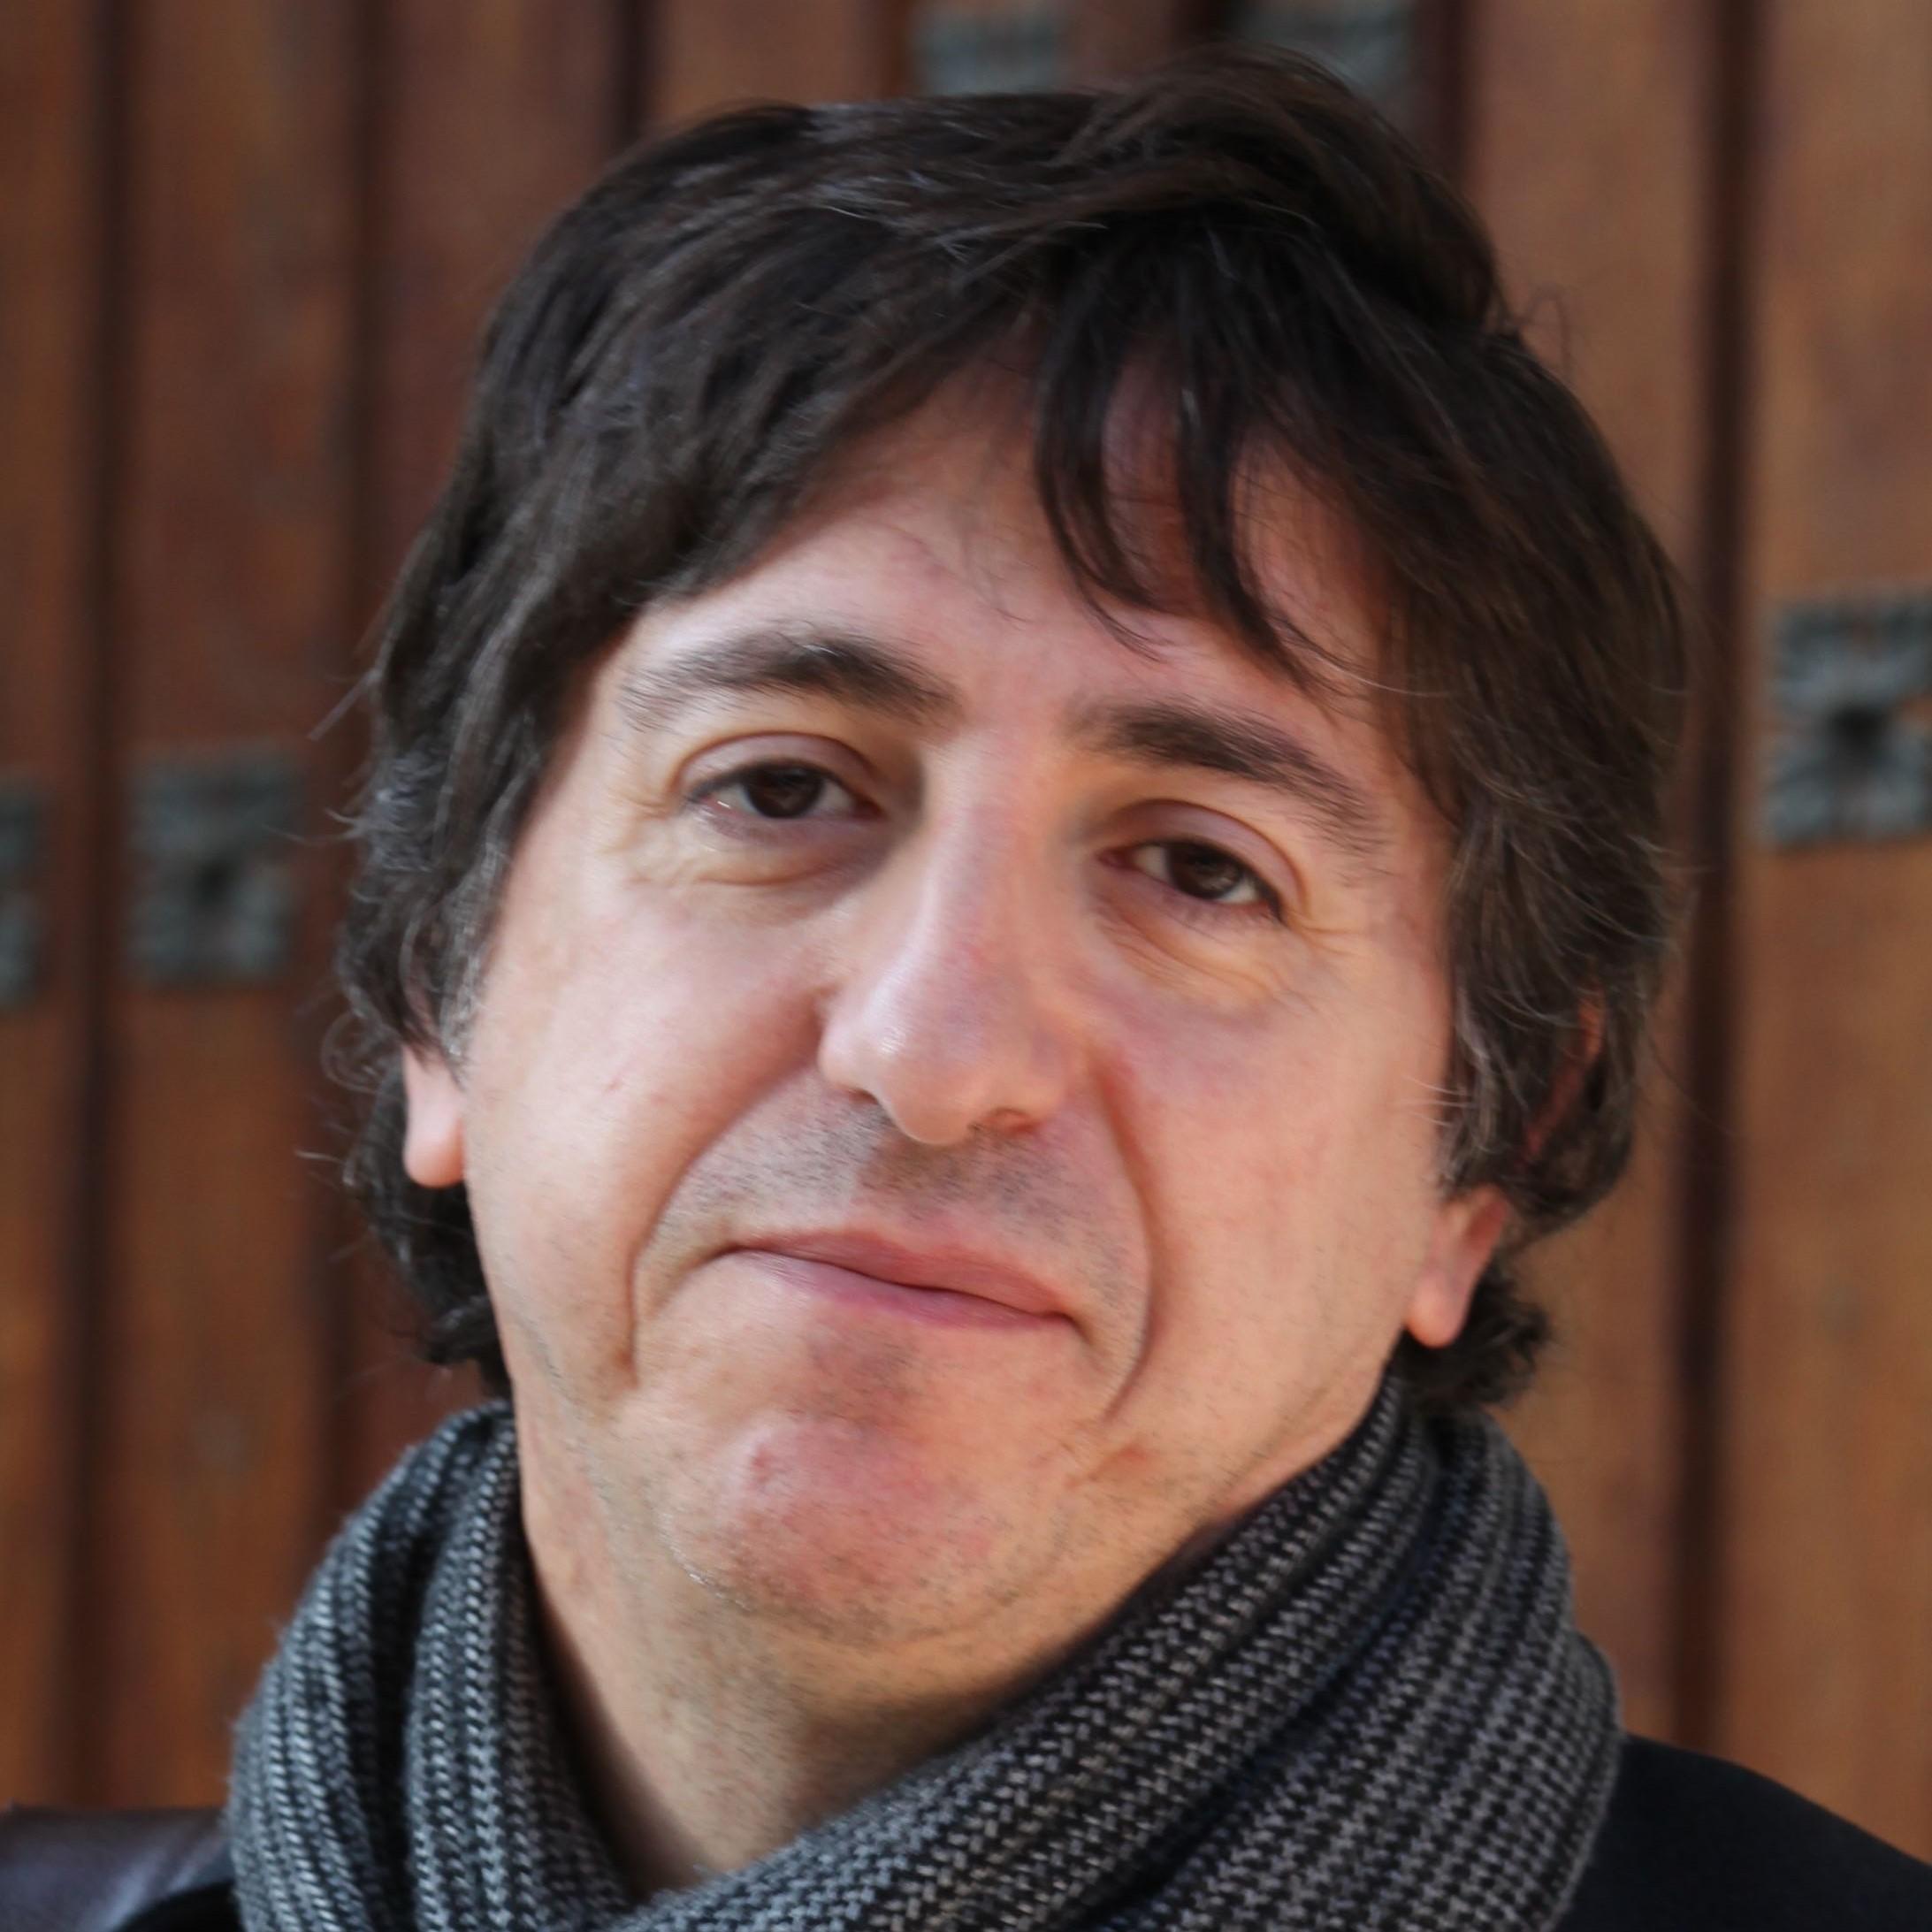 Roberto Fresco